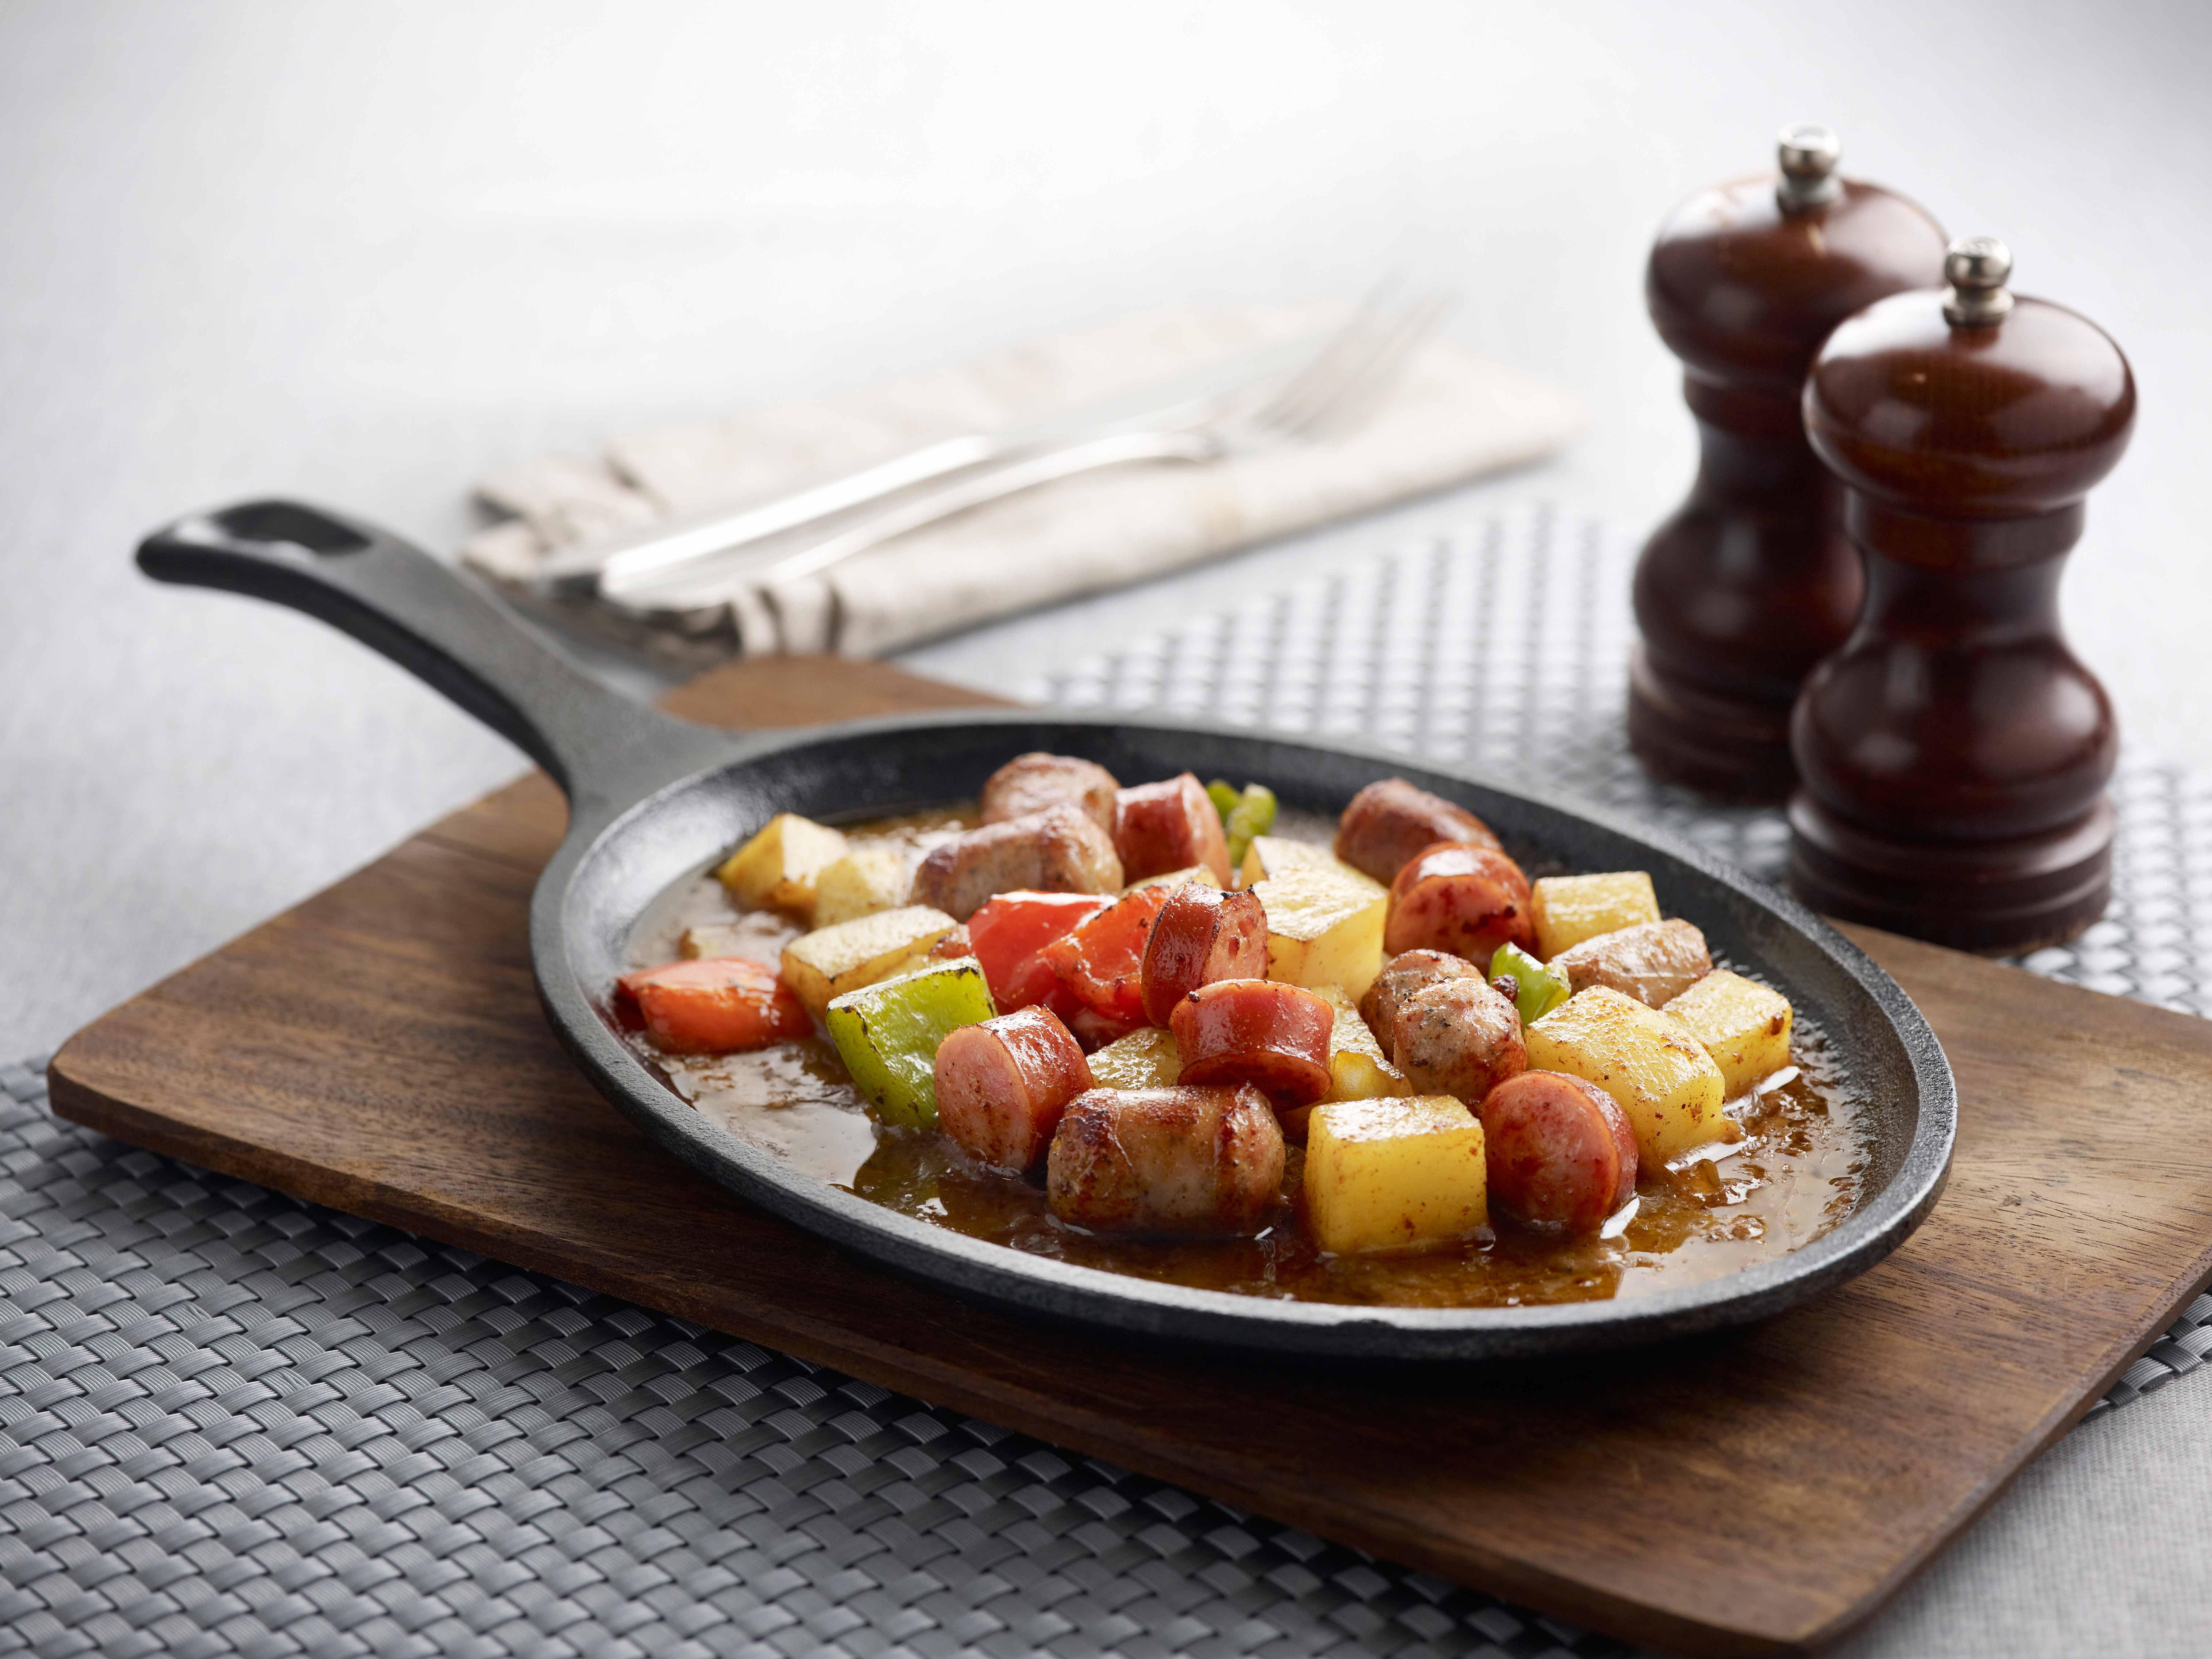 dennys-_sausage-and-pepper-skillet